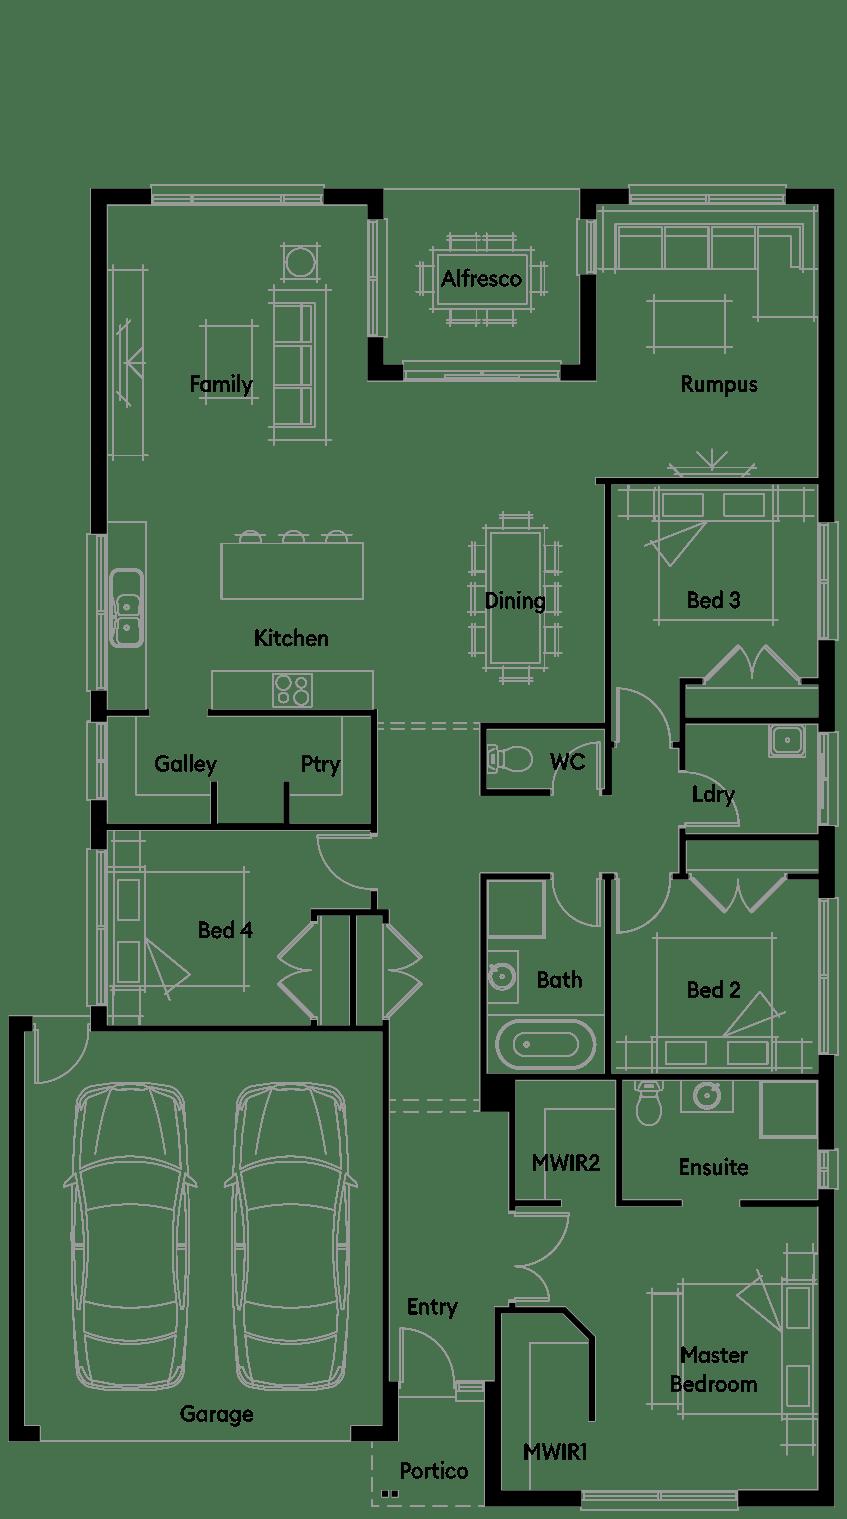 FloorPlan1_HOUSE761_Liverpool_25-5